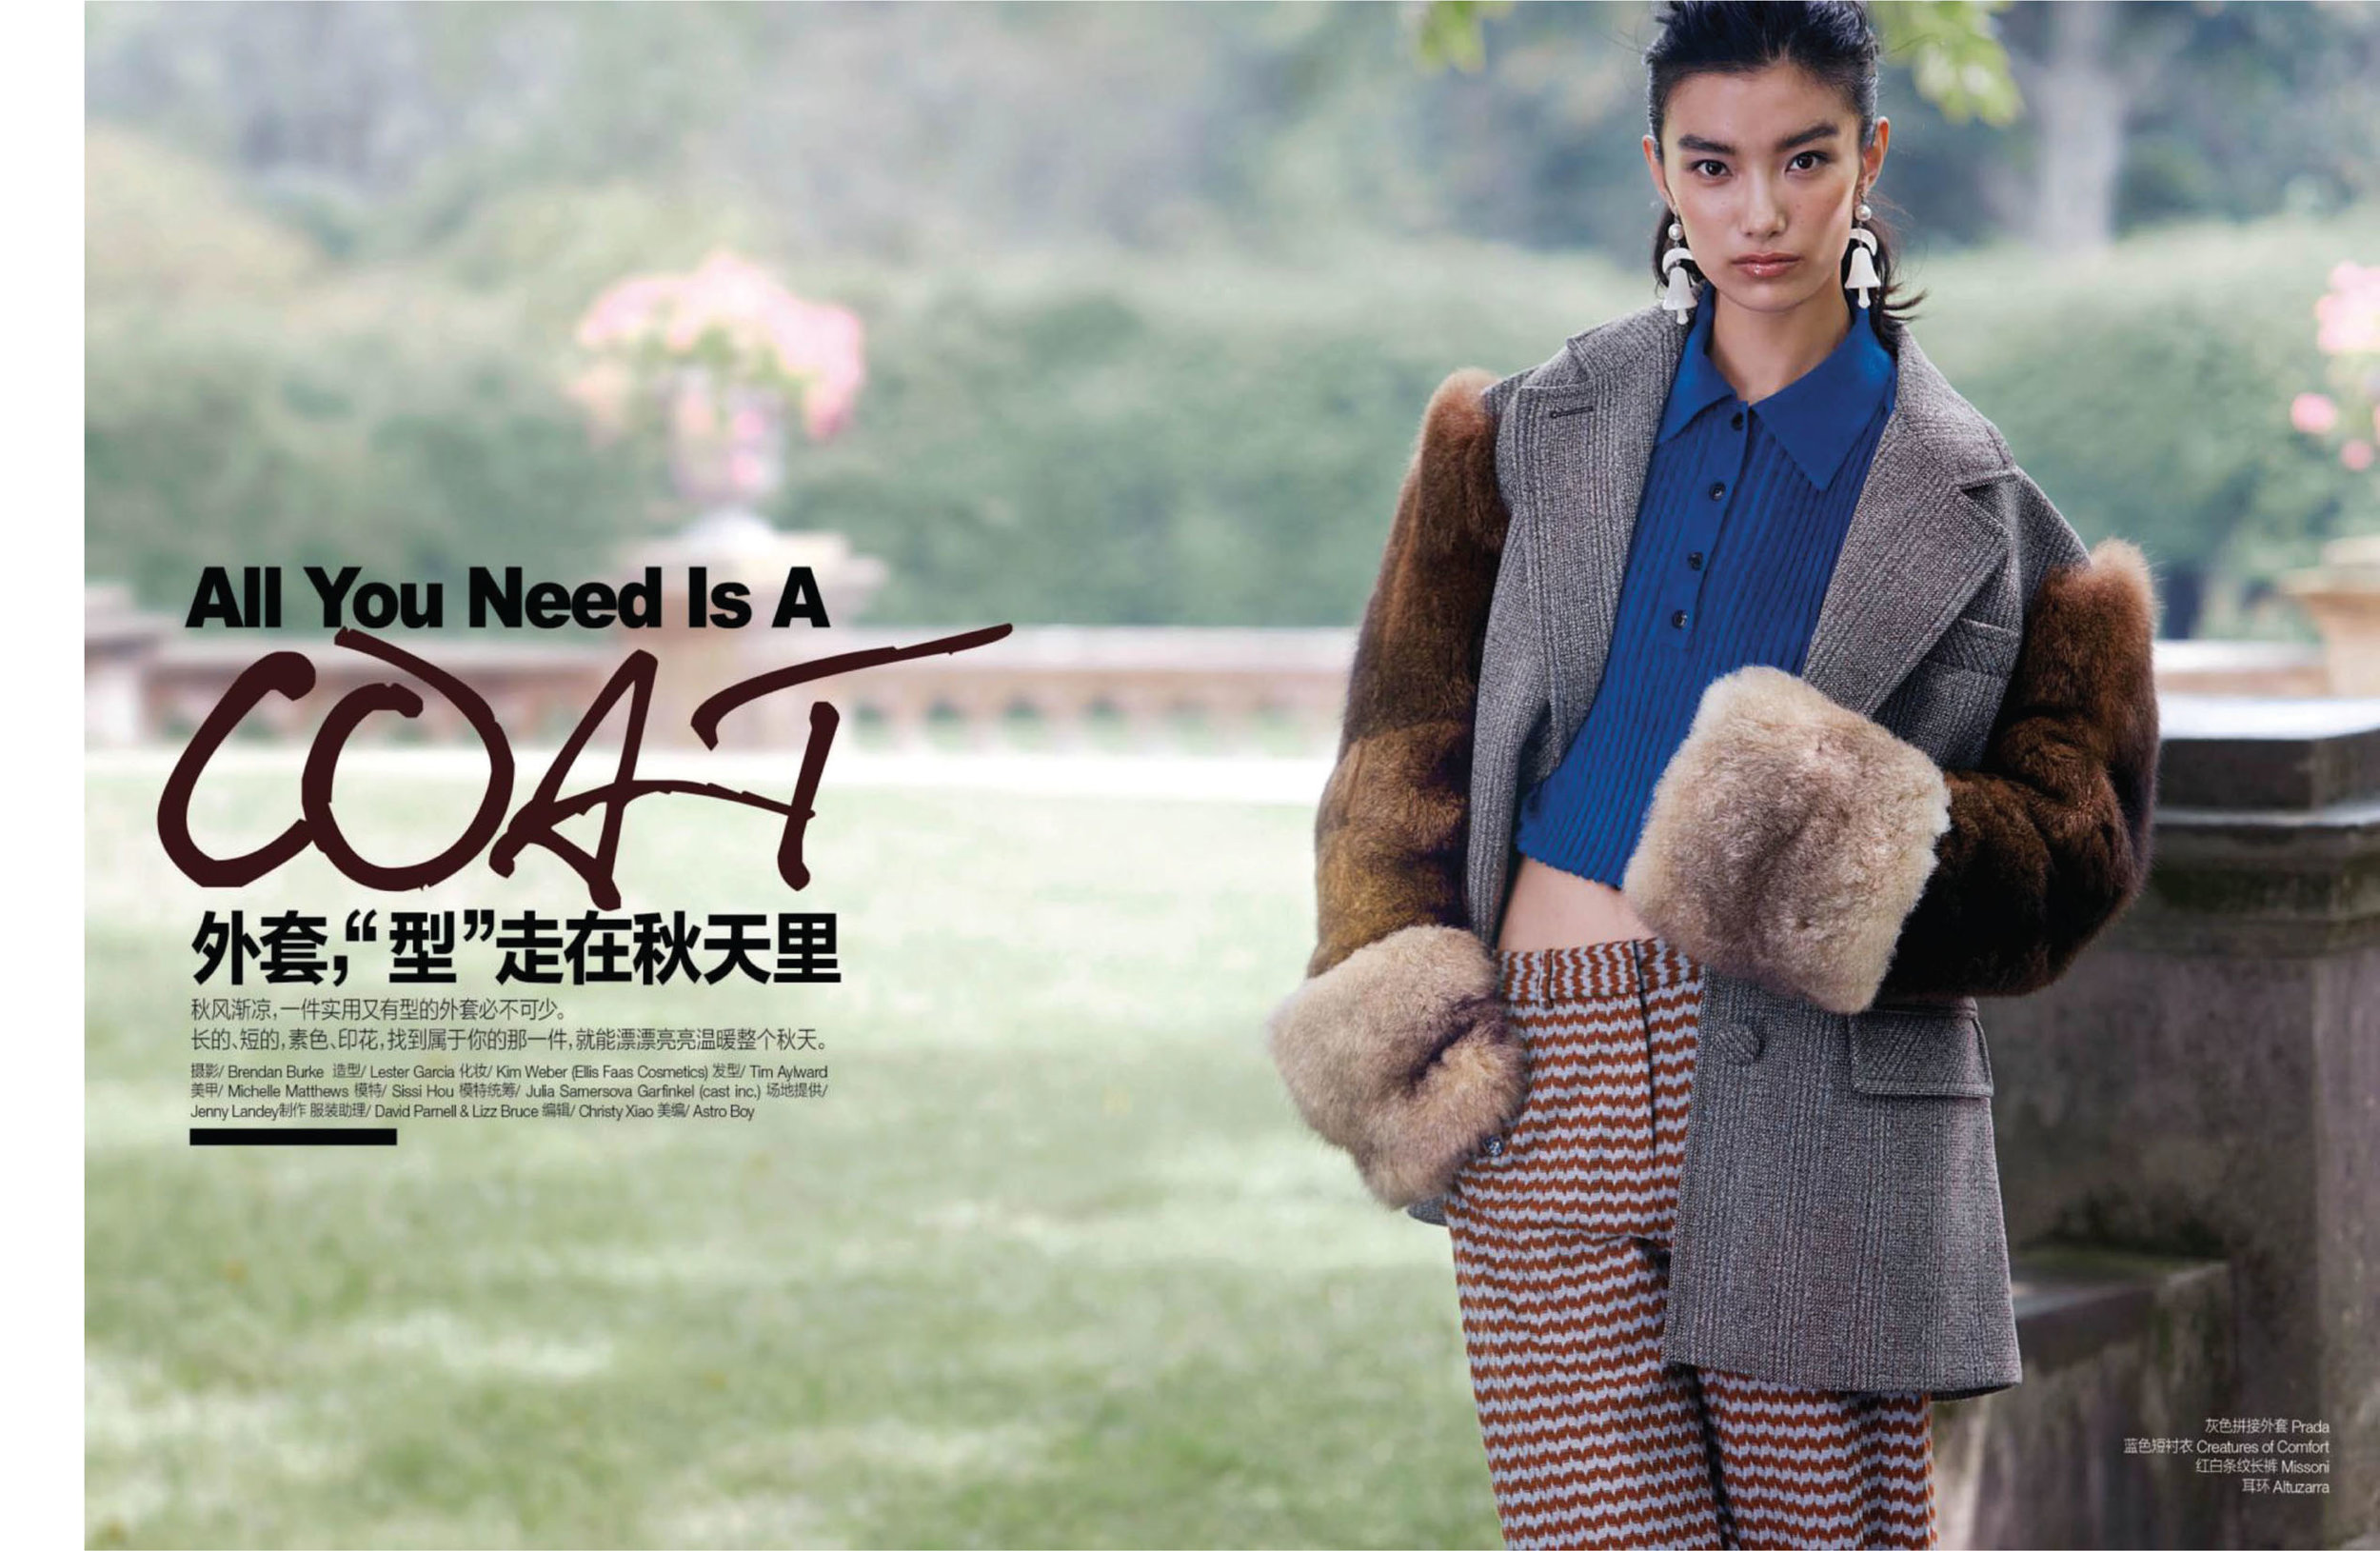 SELF CHINA - COATS